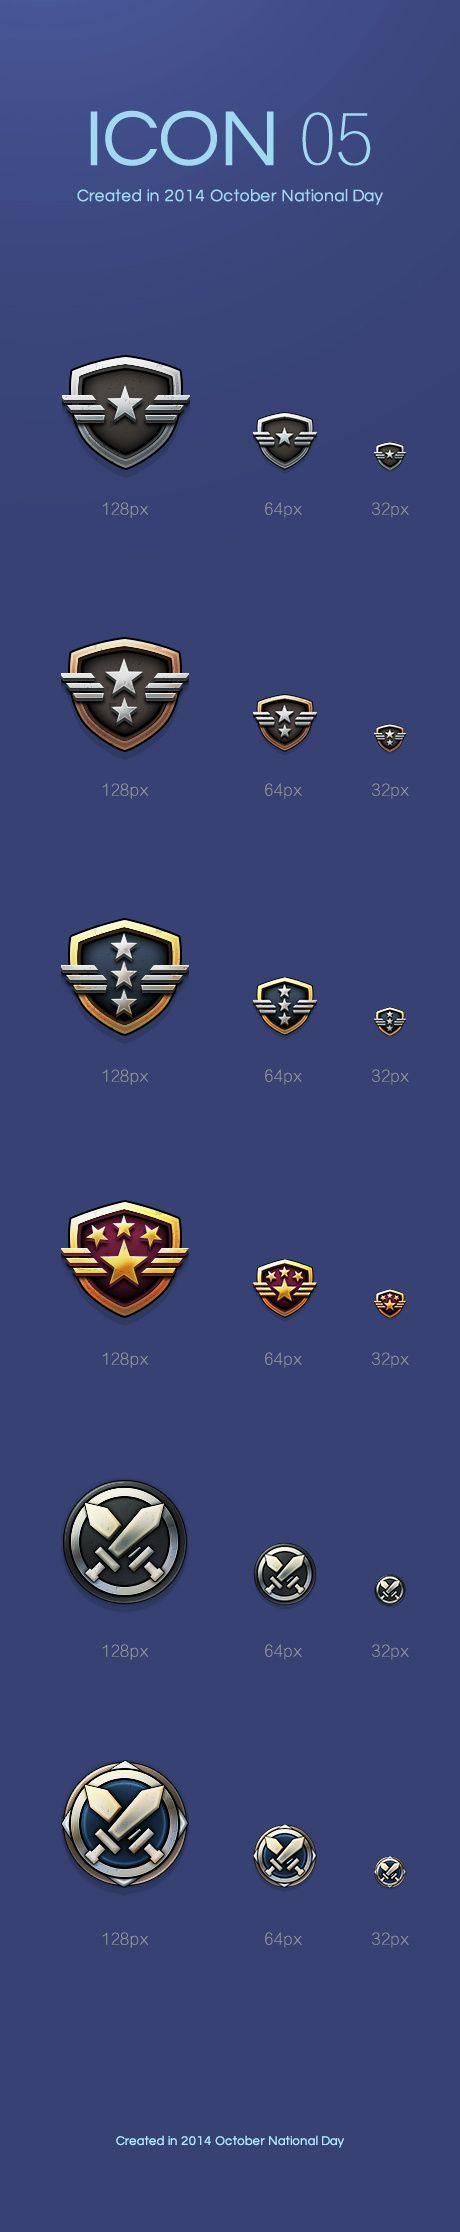 ICON05 等级勋章|图标|GUI|米...